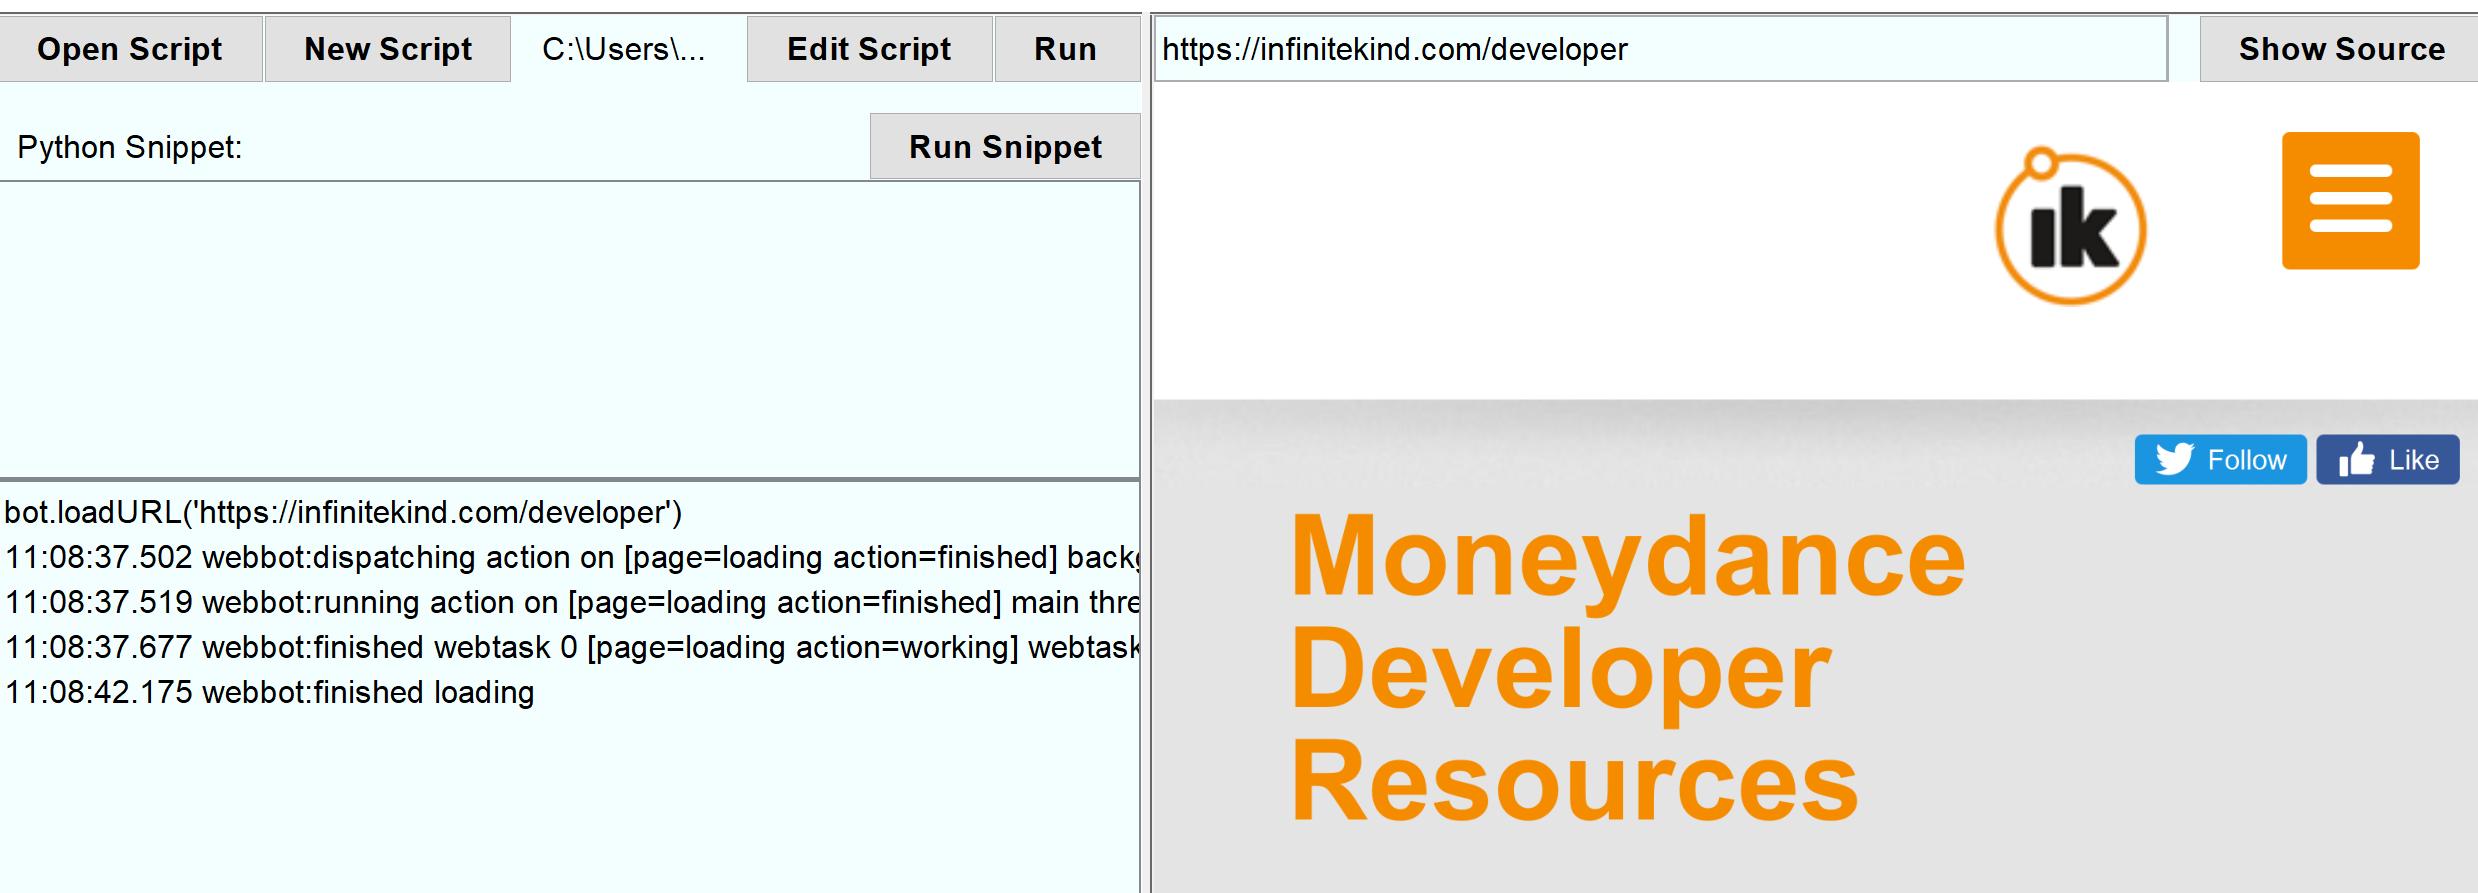 Moneybot_console_window